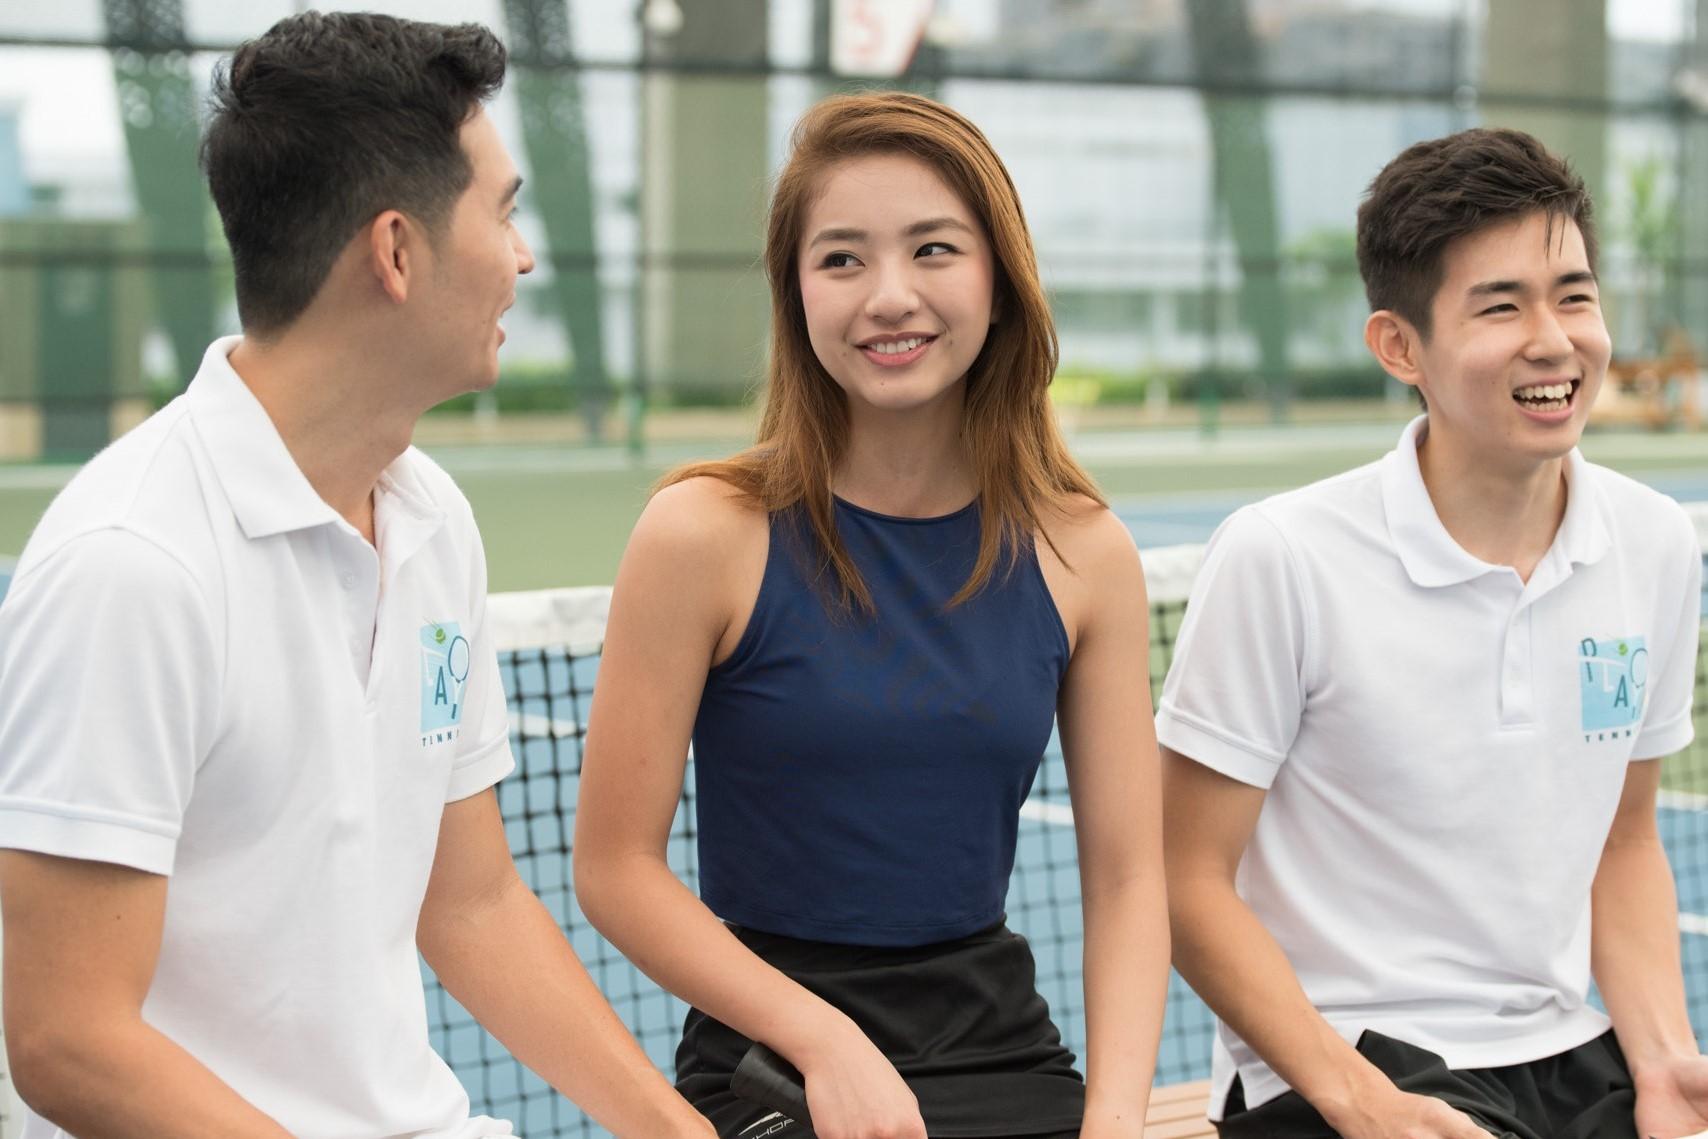 Tennis Lessons Singapore Registration